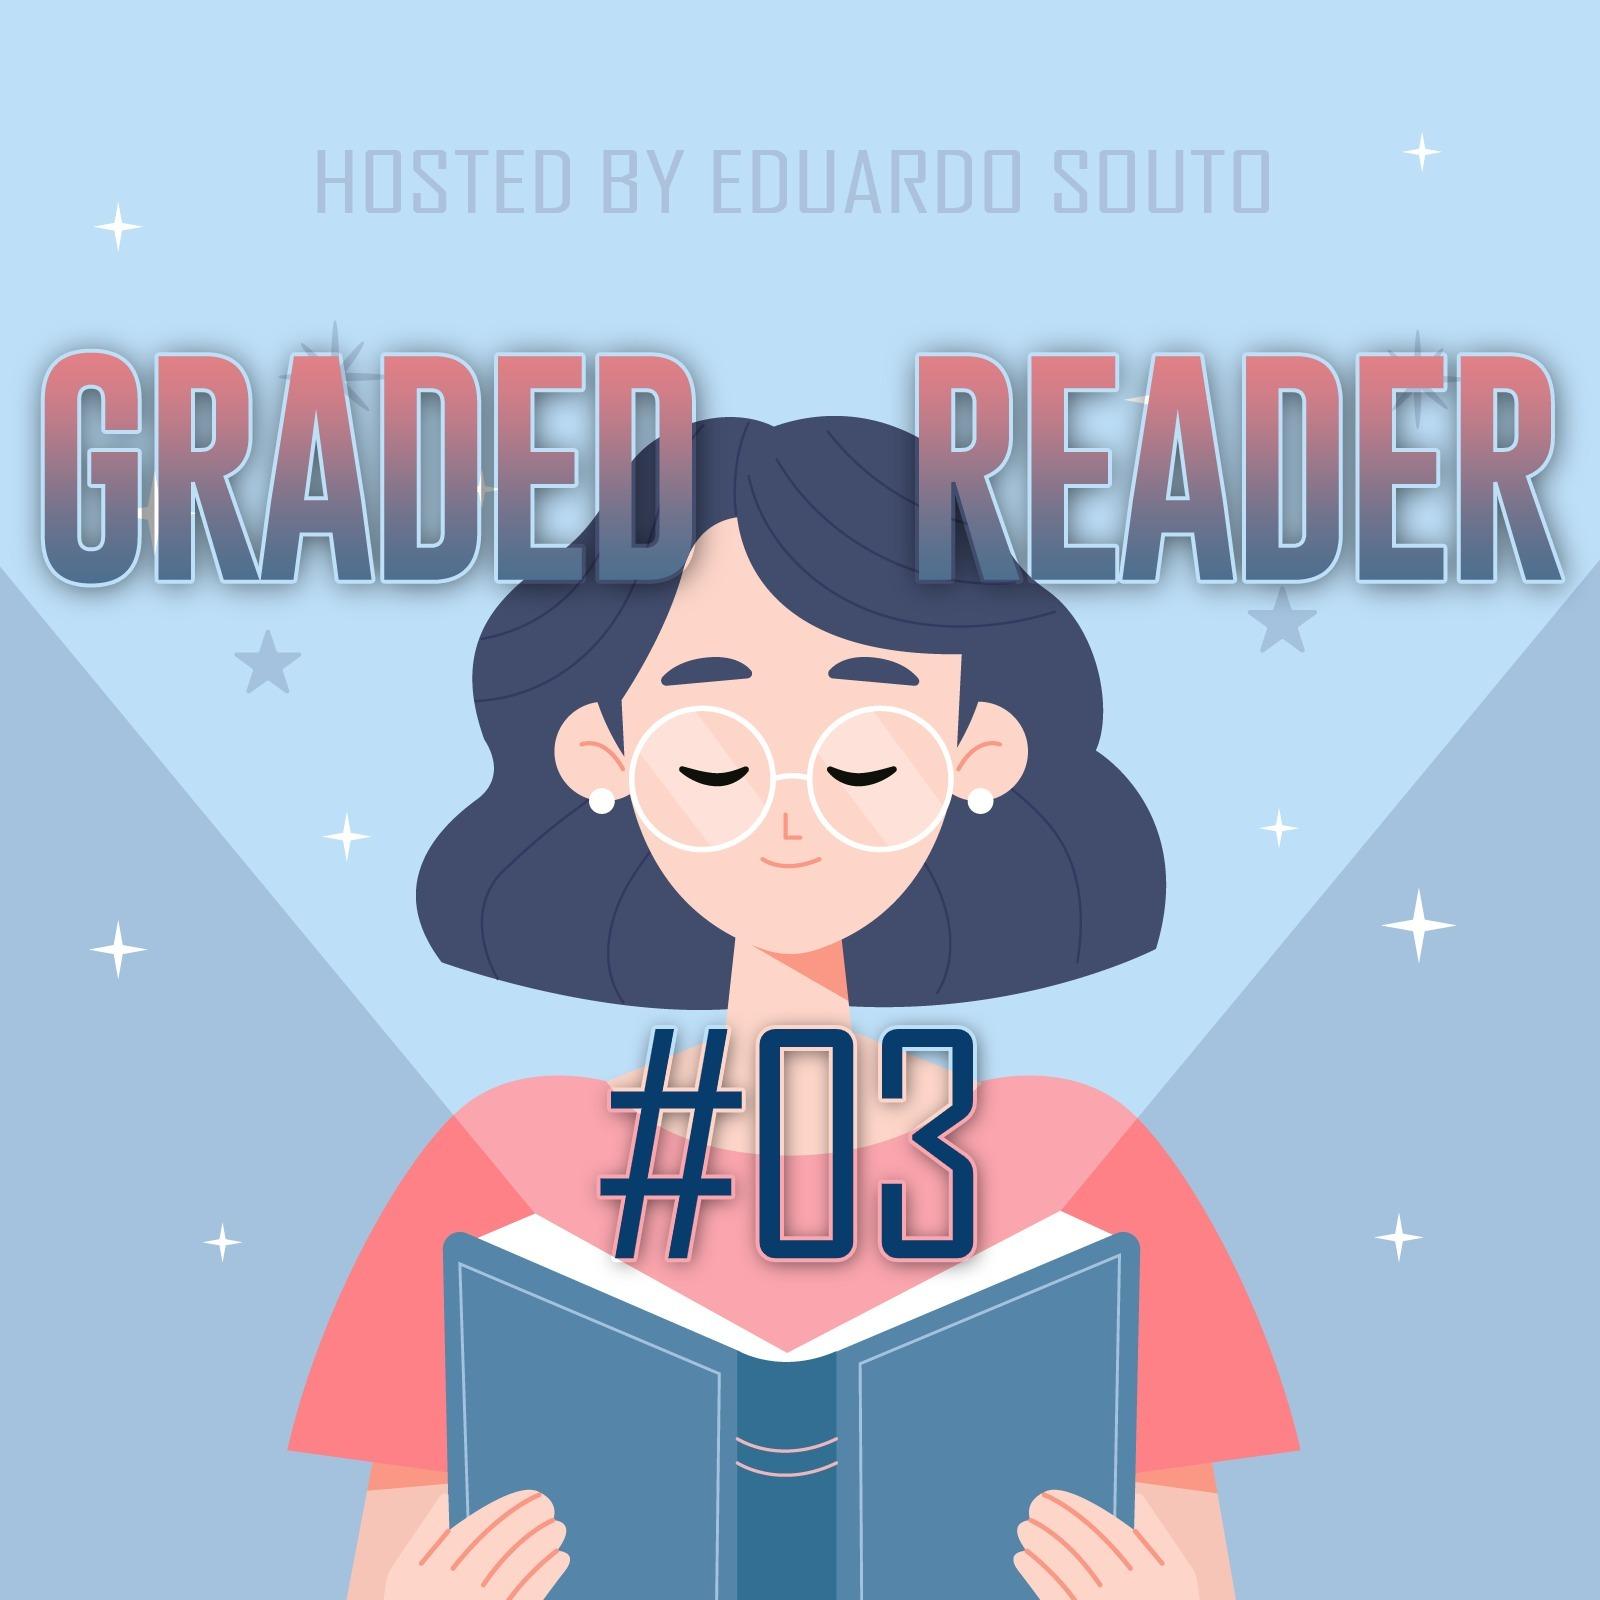 VPFI Graded Reader - Chapter THREE: The Beauty and the Beast